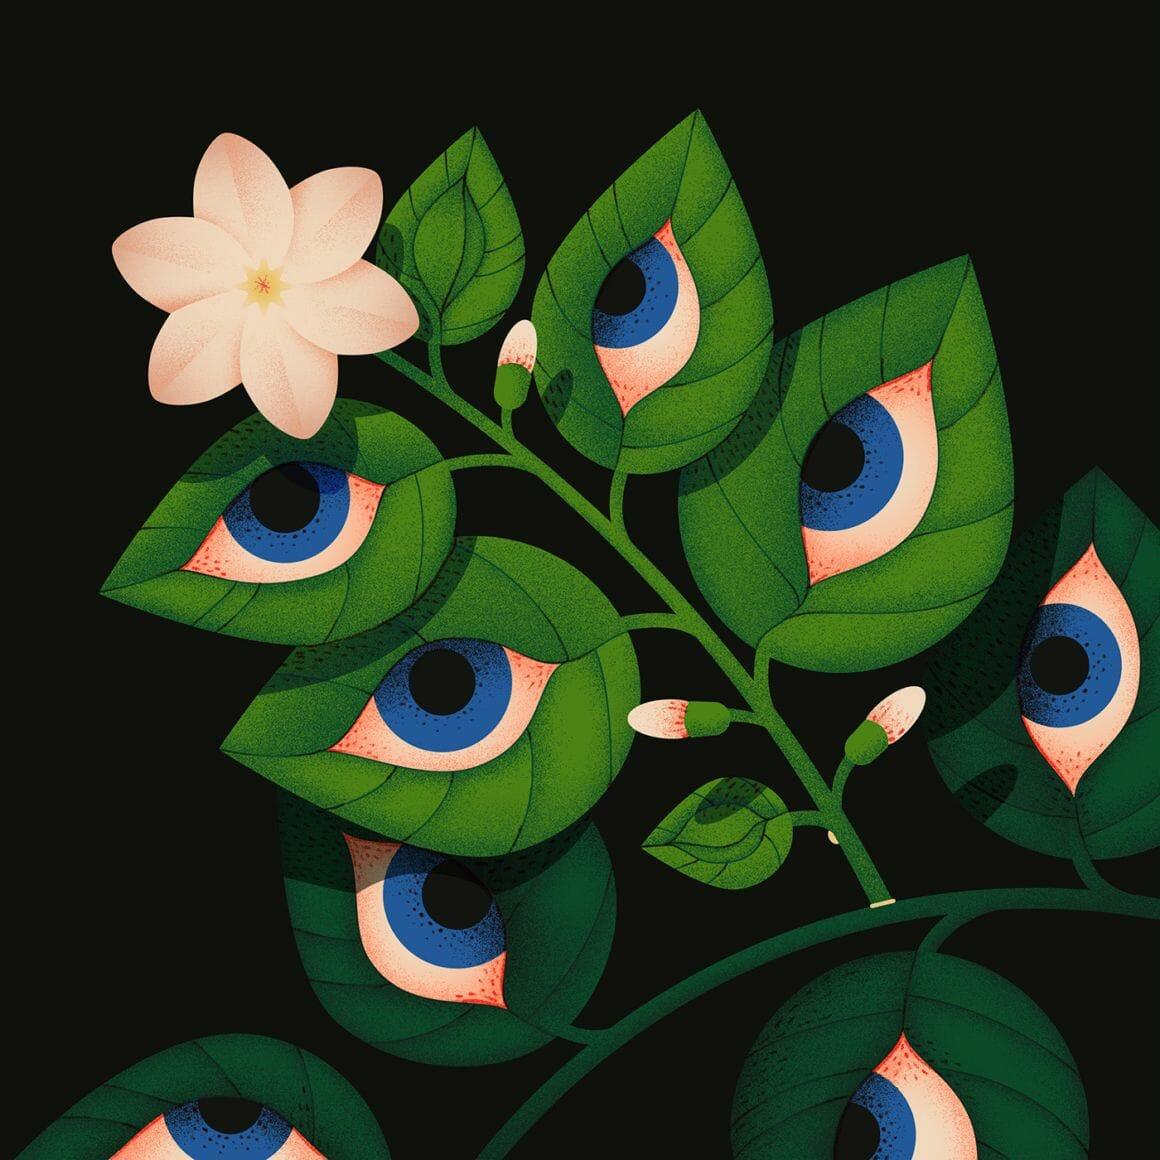 Jasmine, dessin issu de la série Blooming Eyes d'Ana Miminoshvili